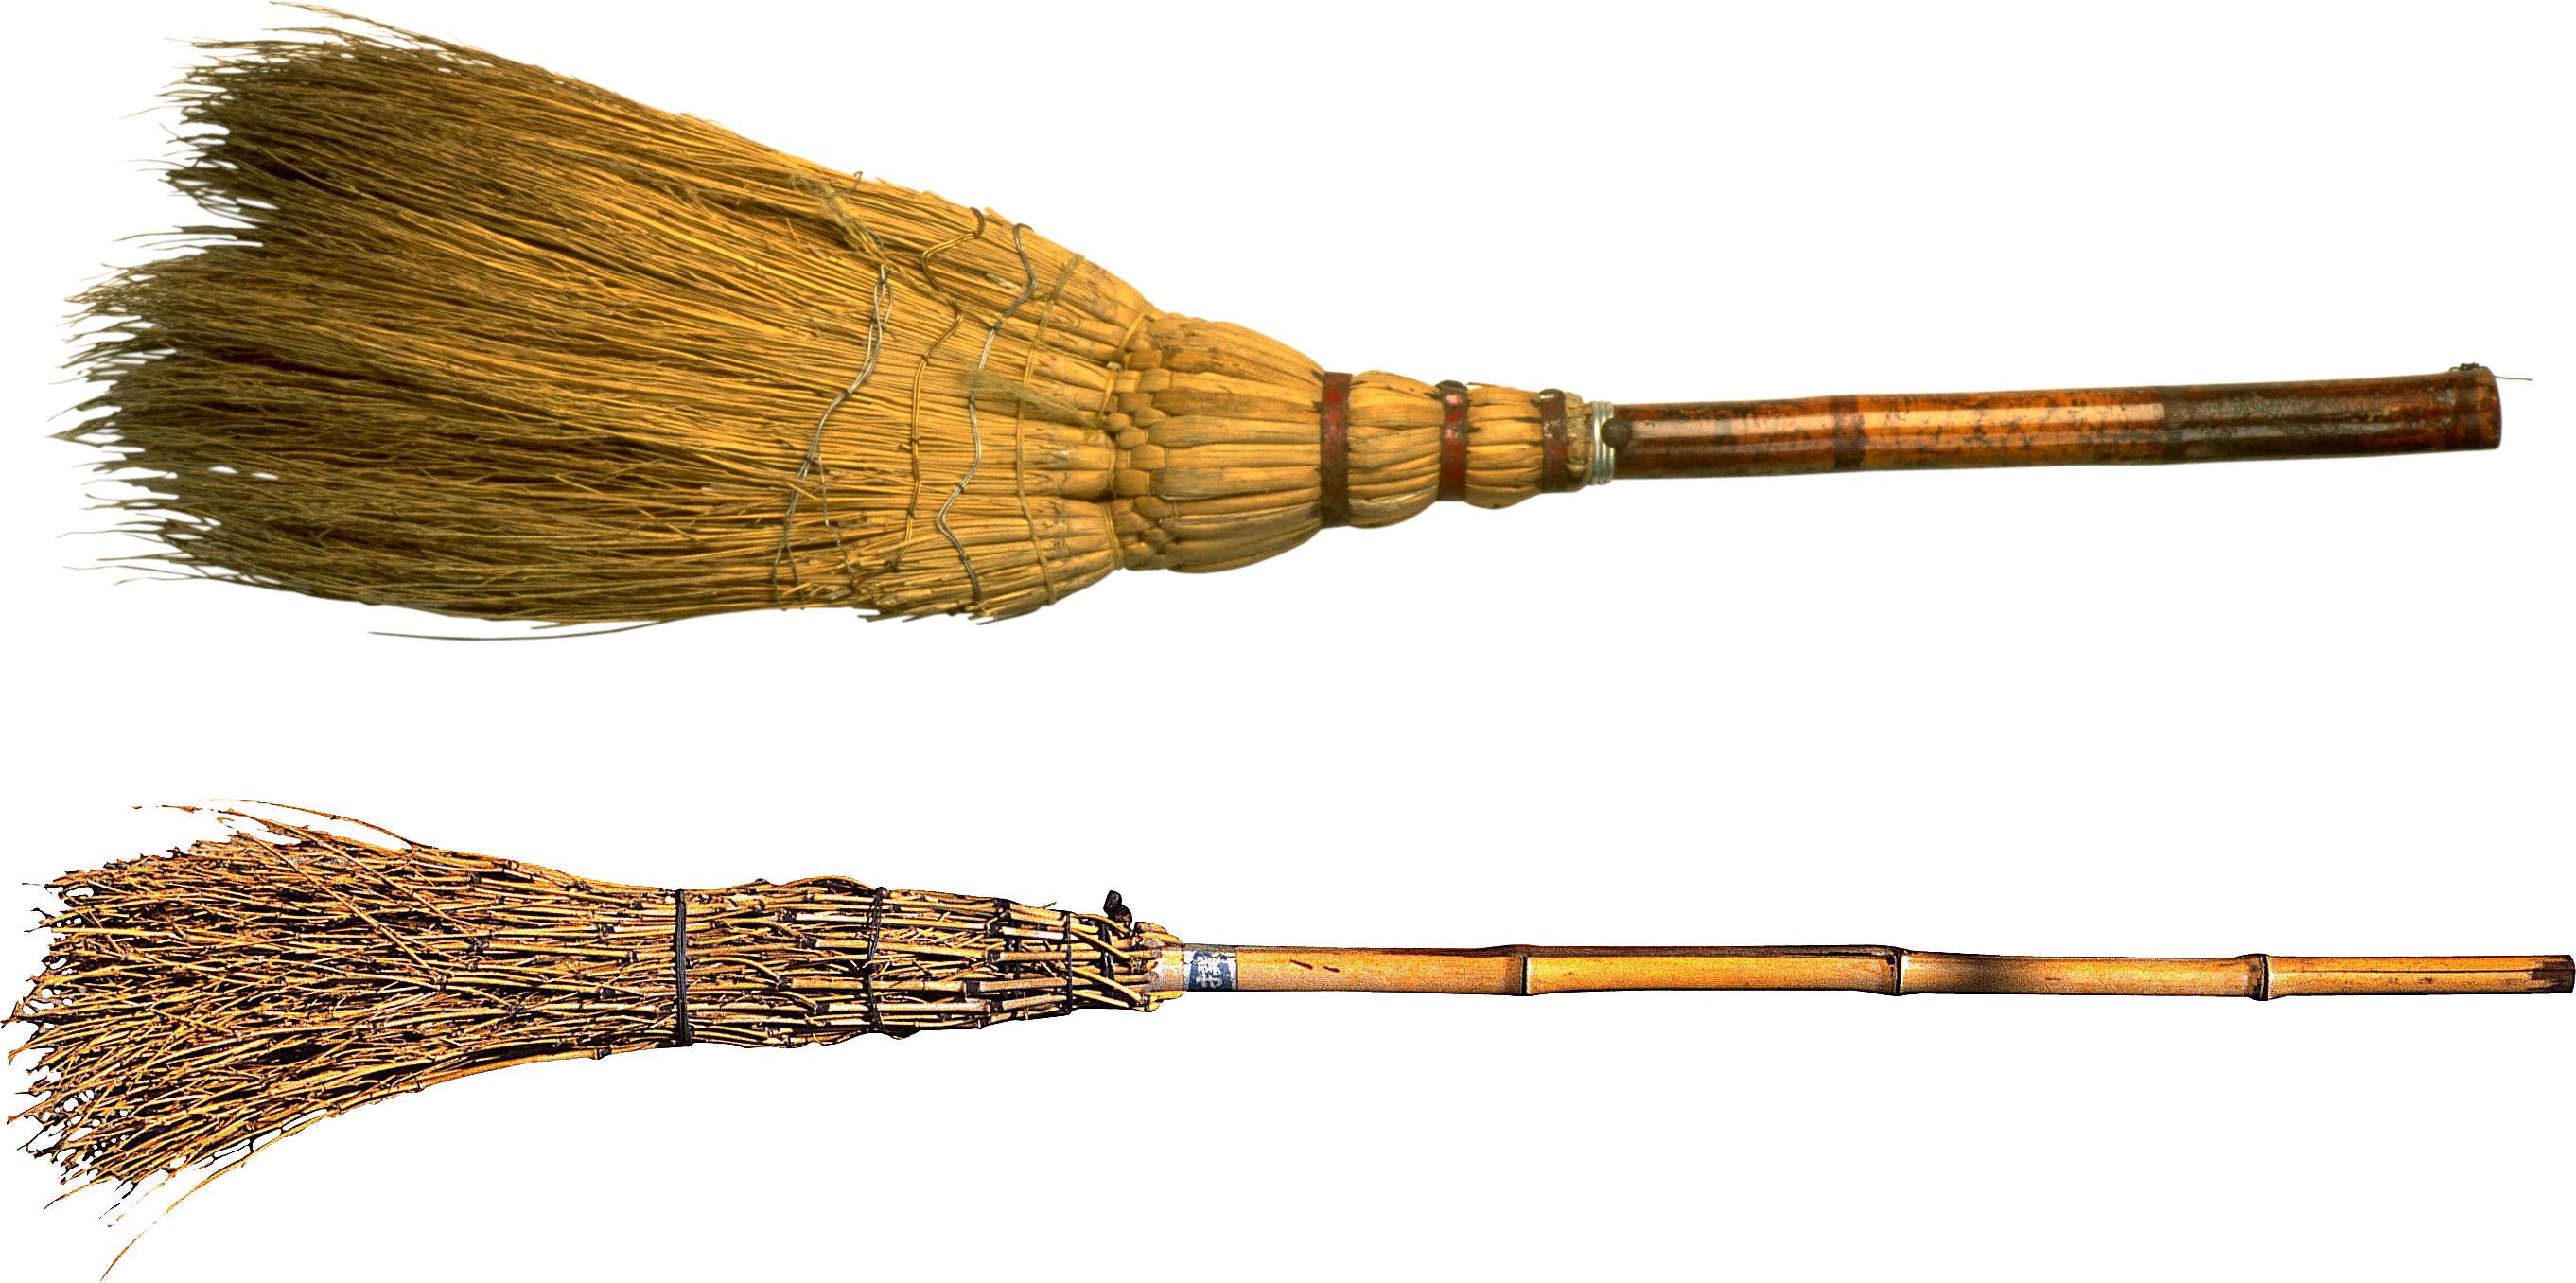 Broom PNG Image